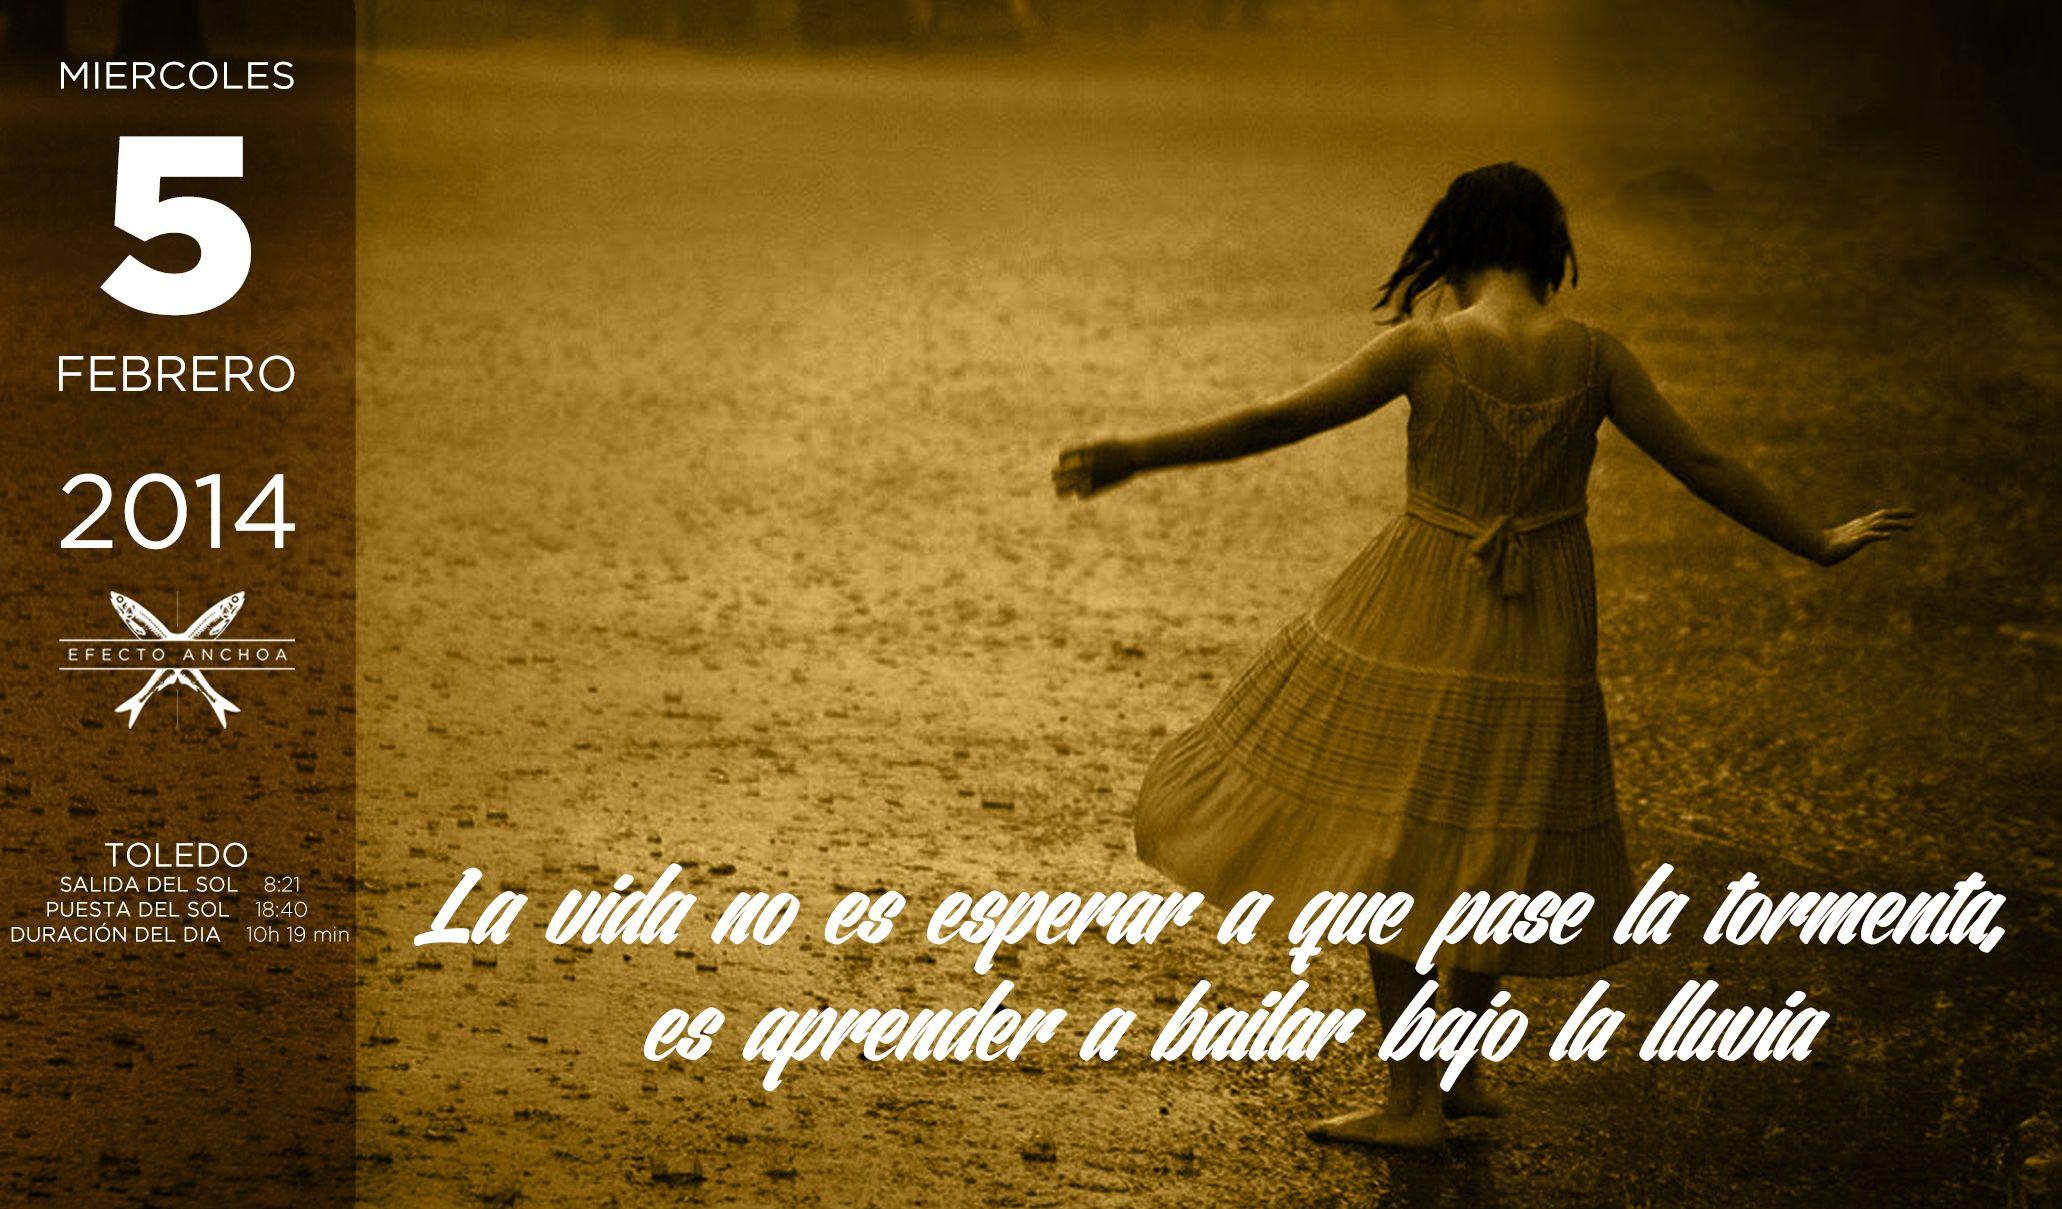 La vida no es esperar a que pase la tormenta, es aprender a bailar bajo la lluvia. Efecto Anchoa